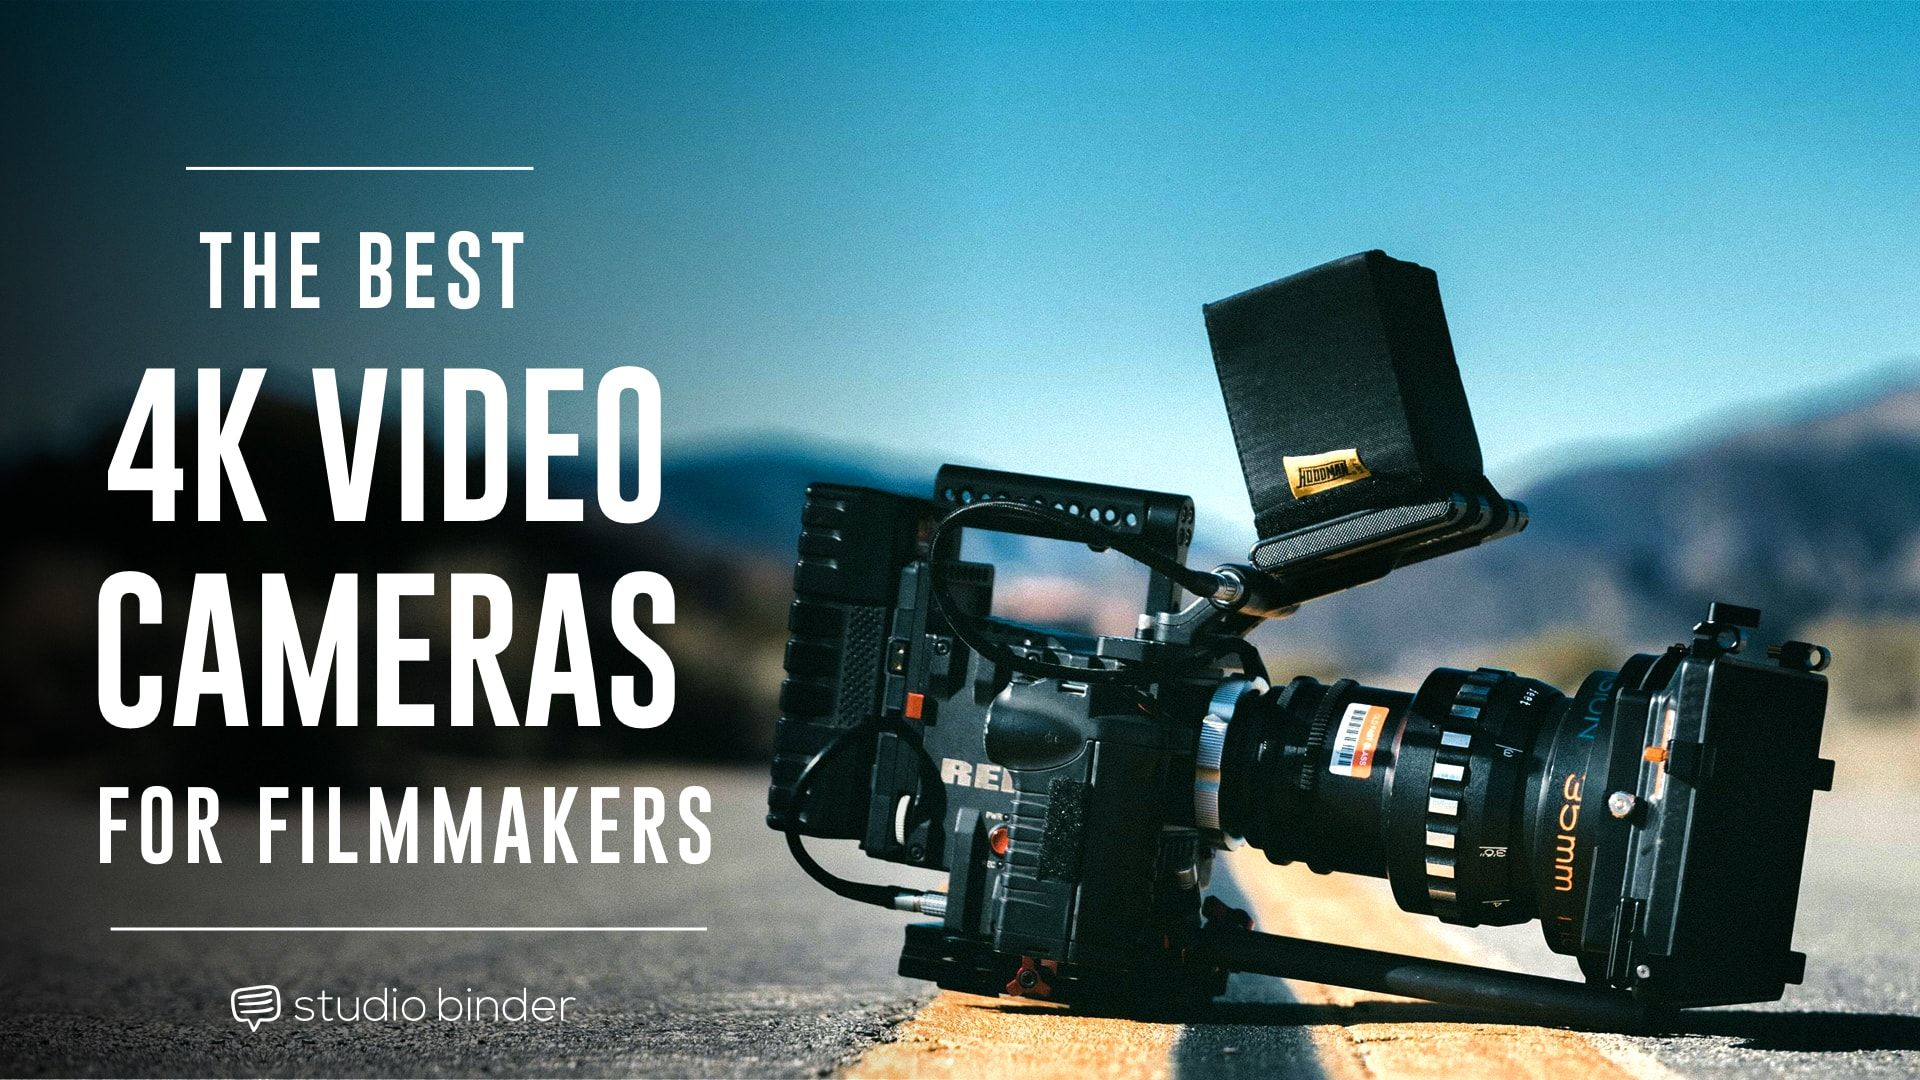 30 Best 4k Video Cameras For Filmmakers In 2020 Filmmaking Video Cameras Camera